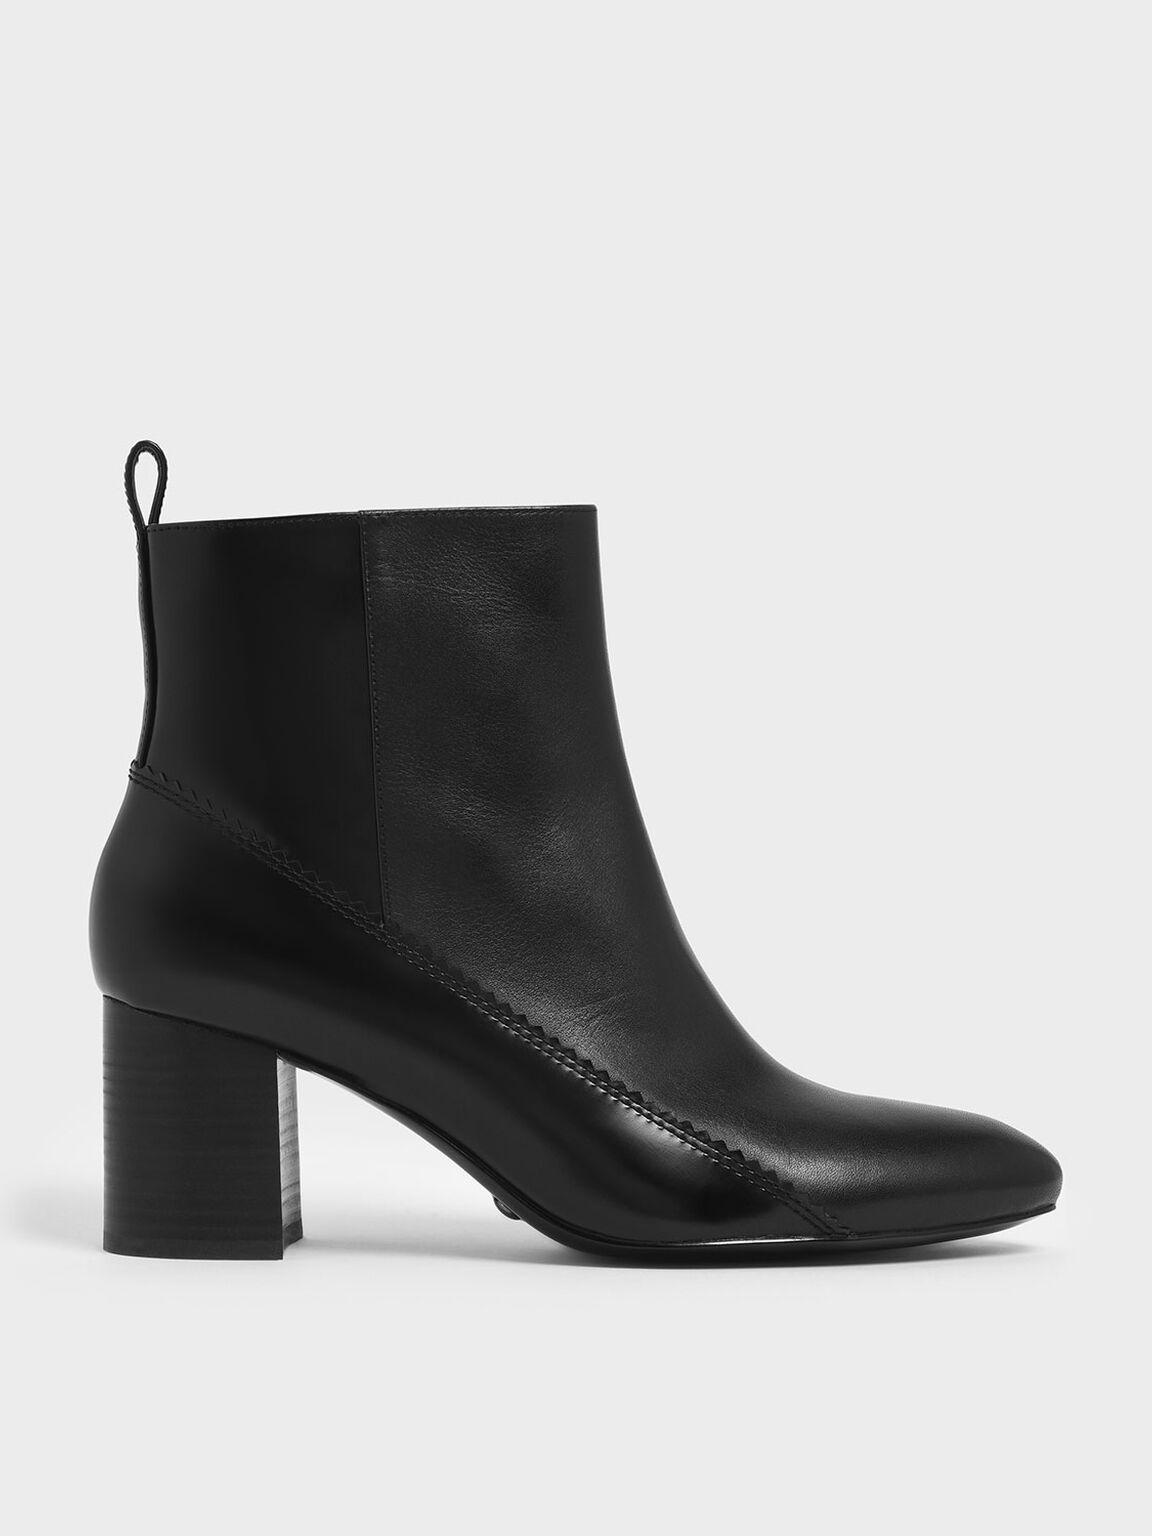 Zigzag Detail Zip-Up Leather Ankle Boots, Black, hi-res